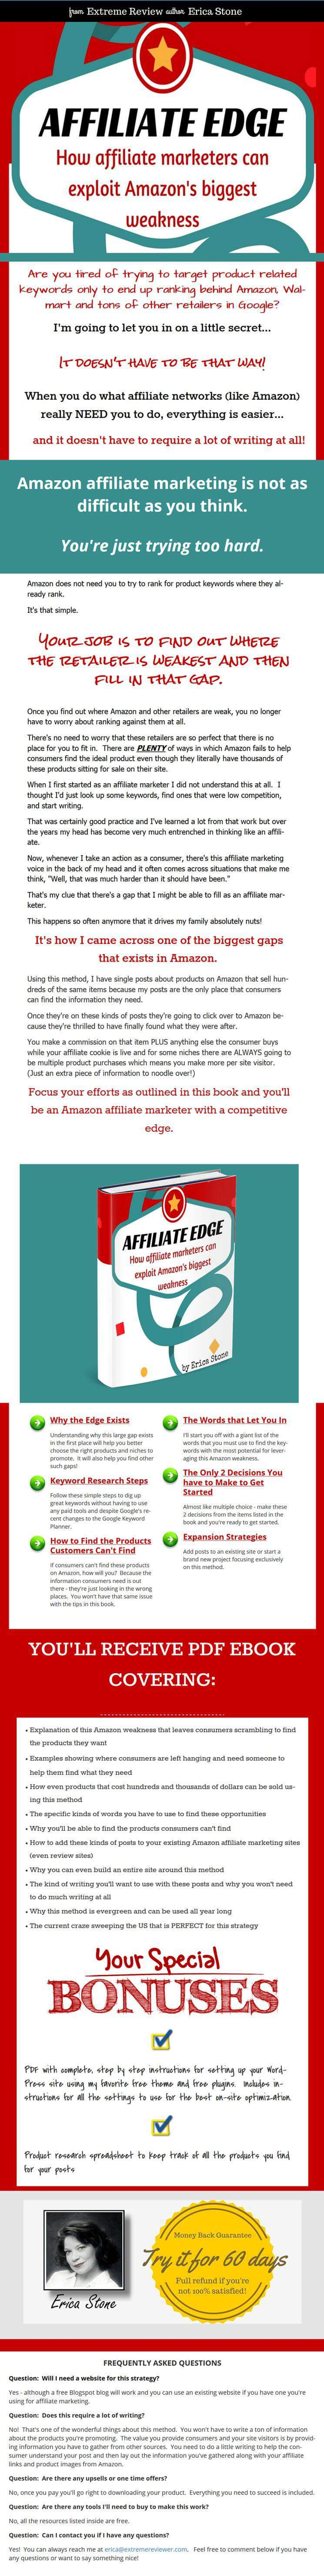 Amazon affiliate marketer - 如何利用亚马逊最大的弱点来获 得更轻松的销售和佣金(Affiliate Edge)